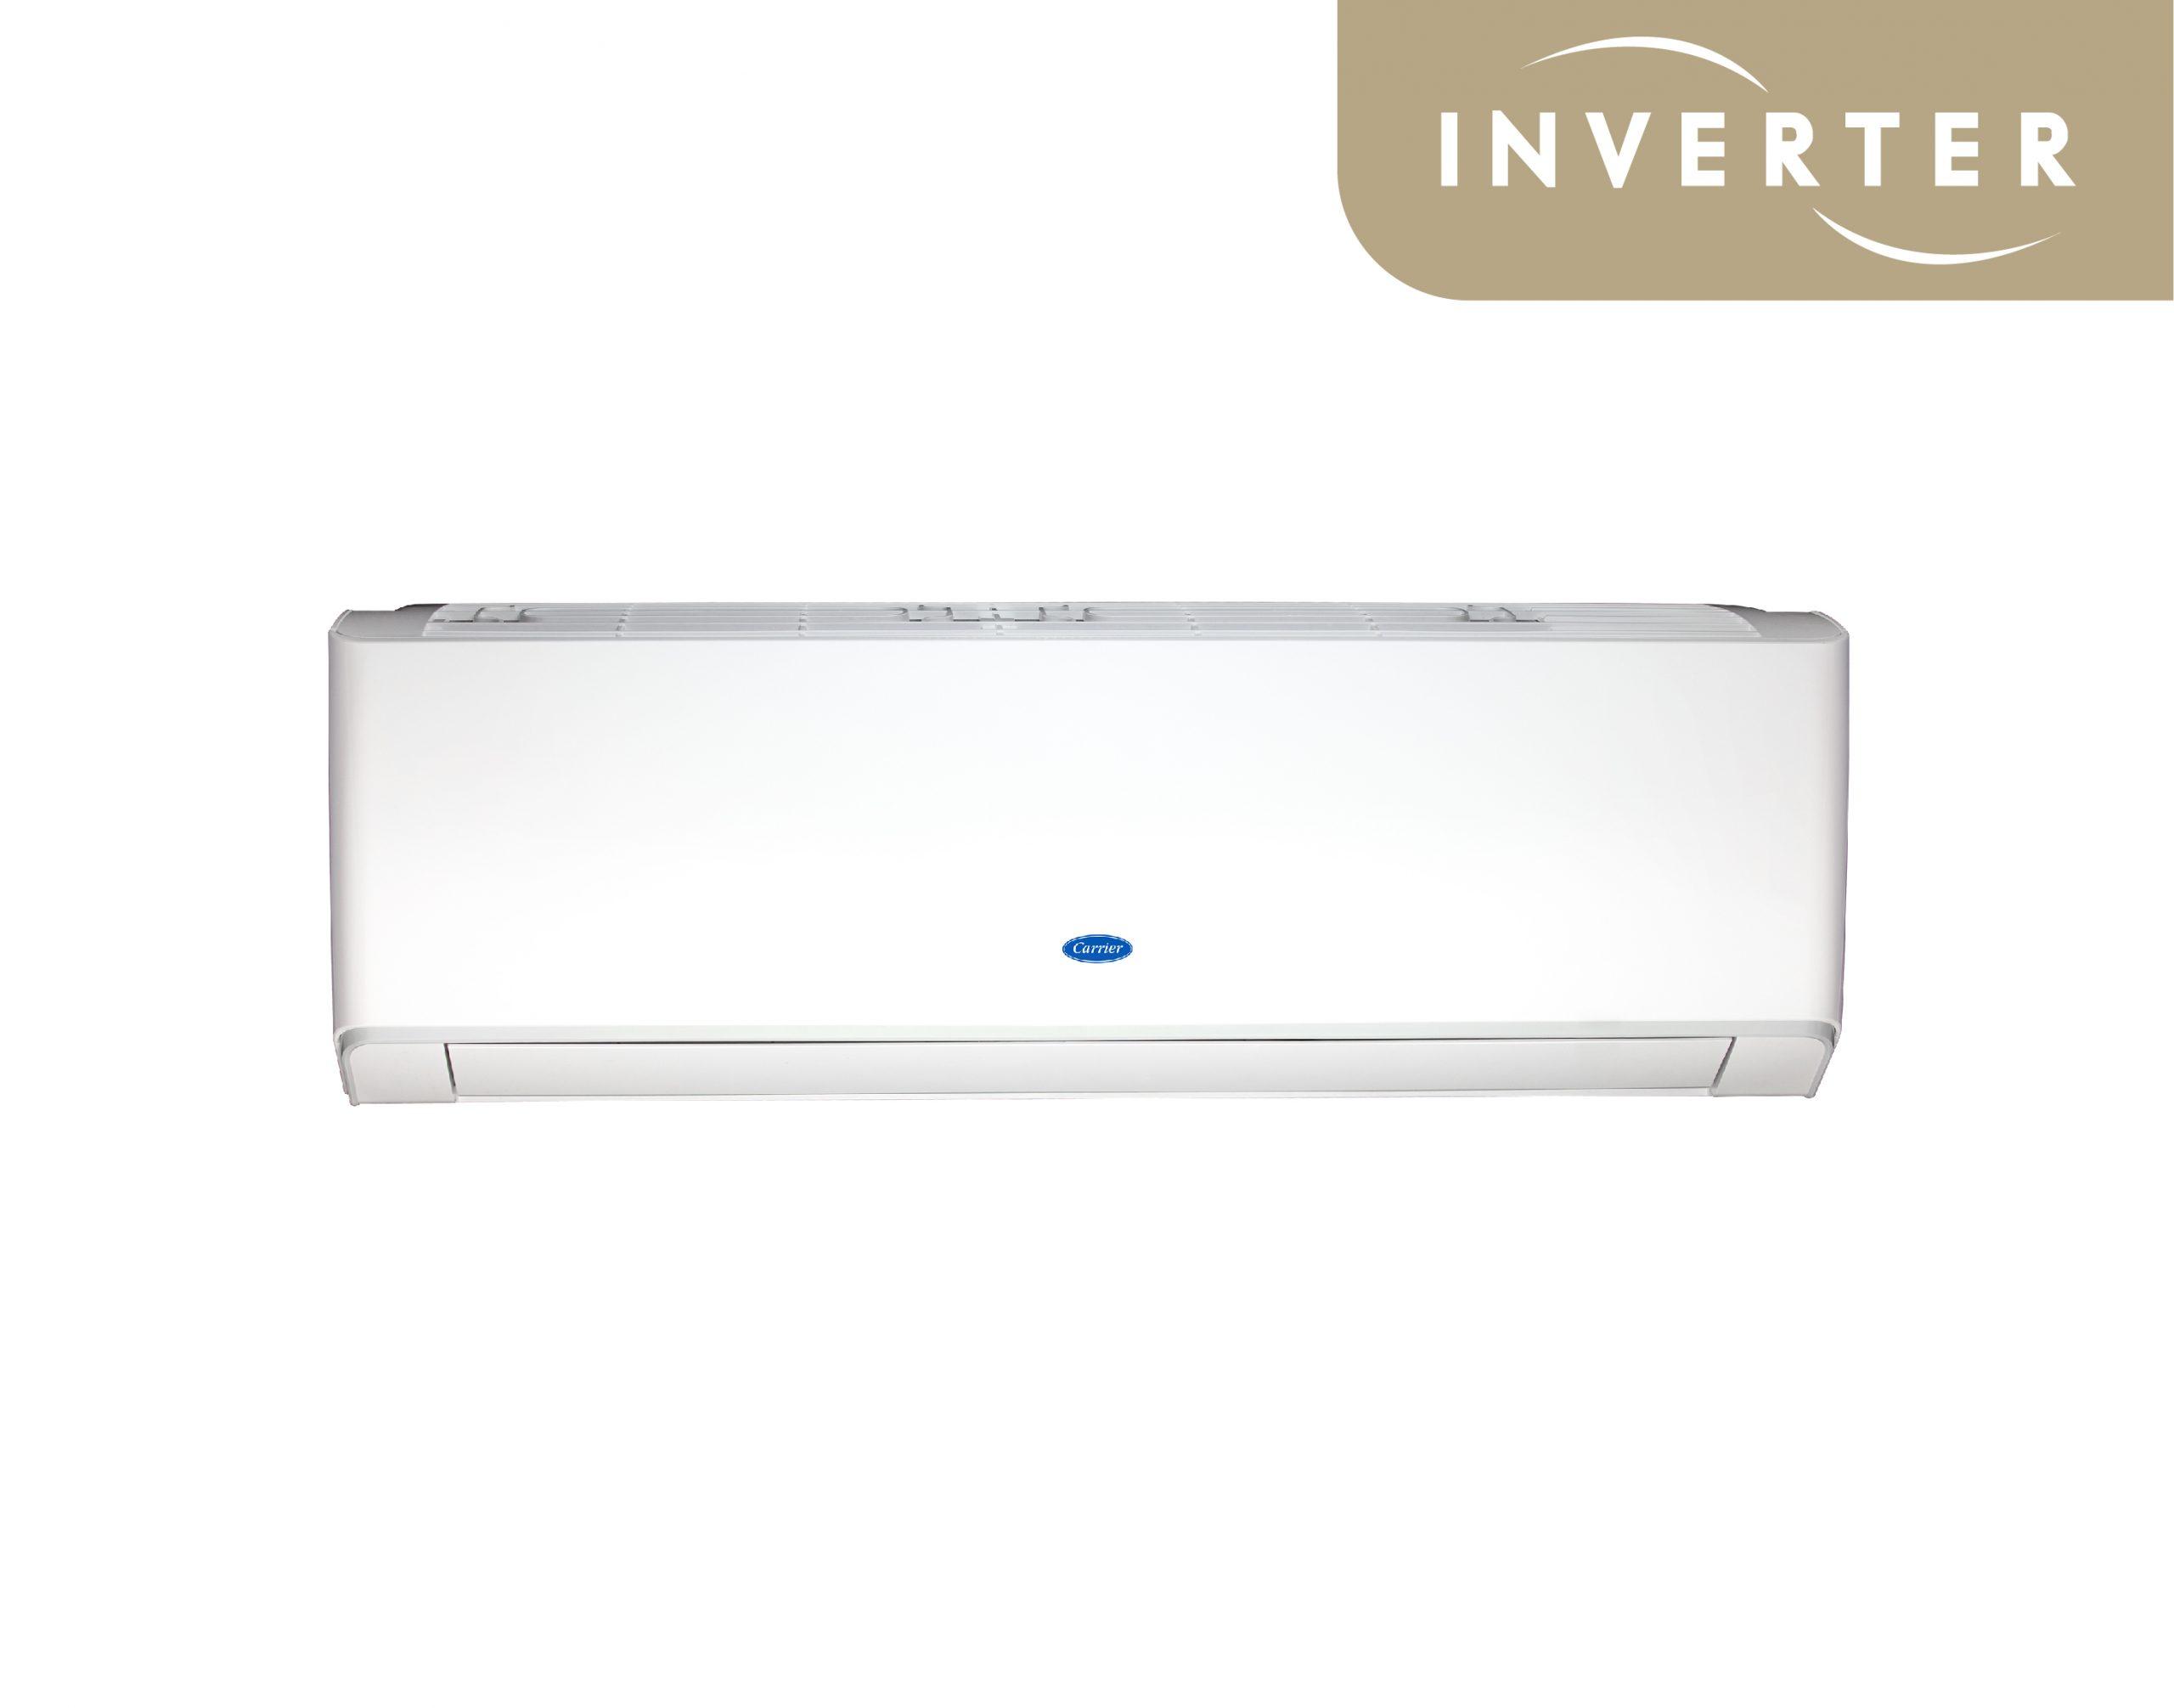 inverter-genz-product